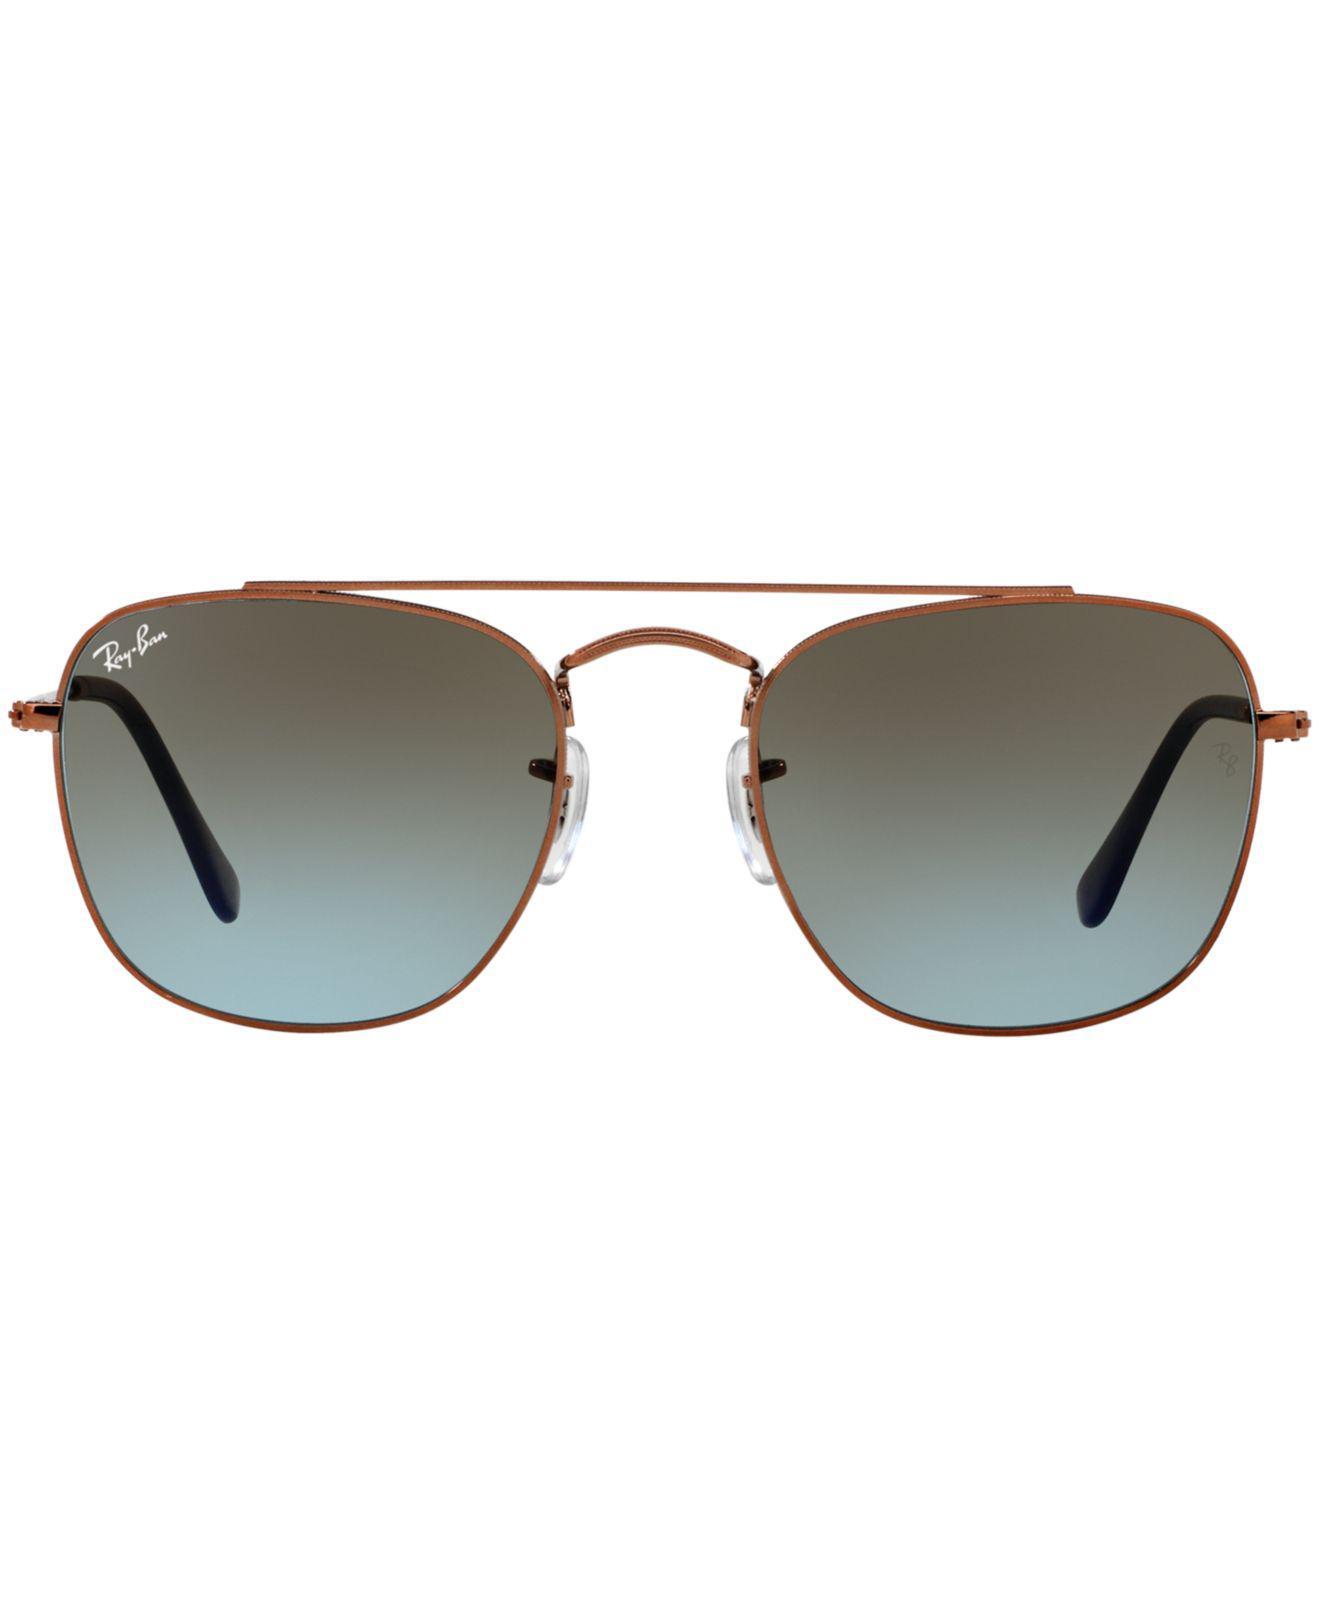 6492ac02a49 Lyst - Ray-Ban Sunglasses